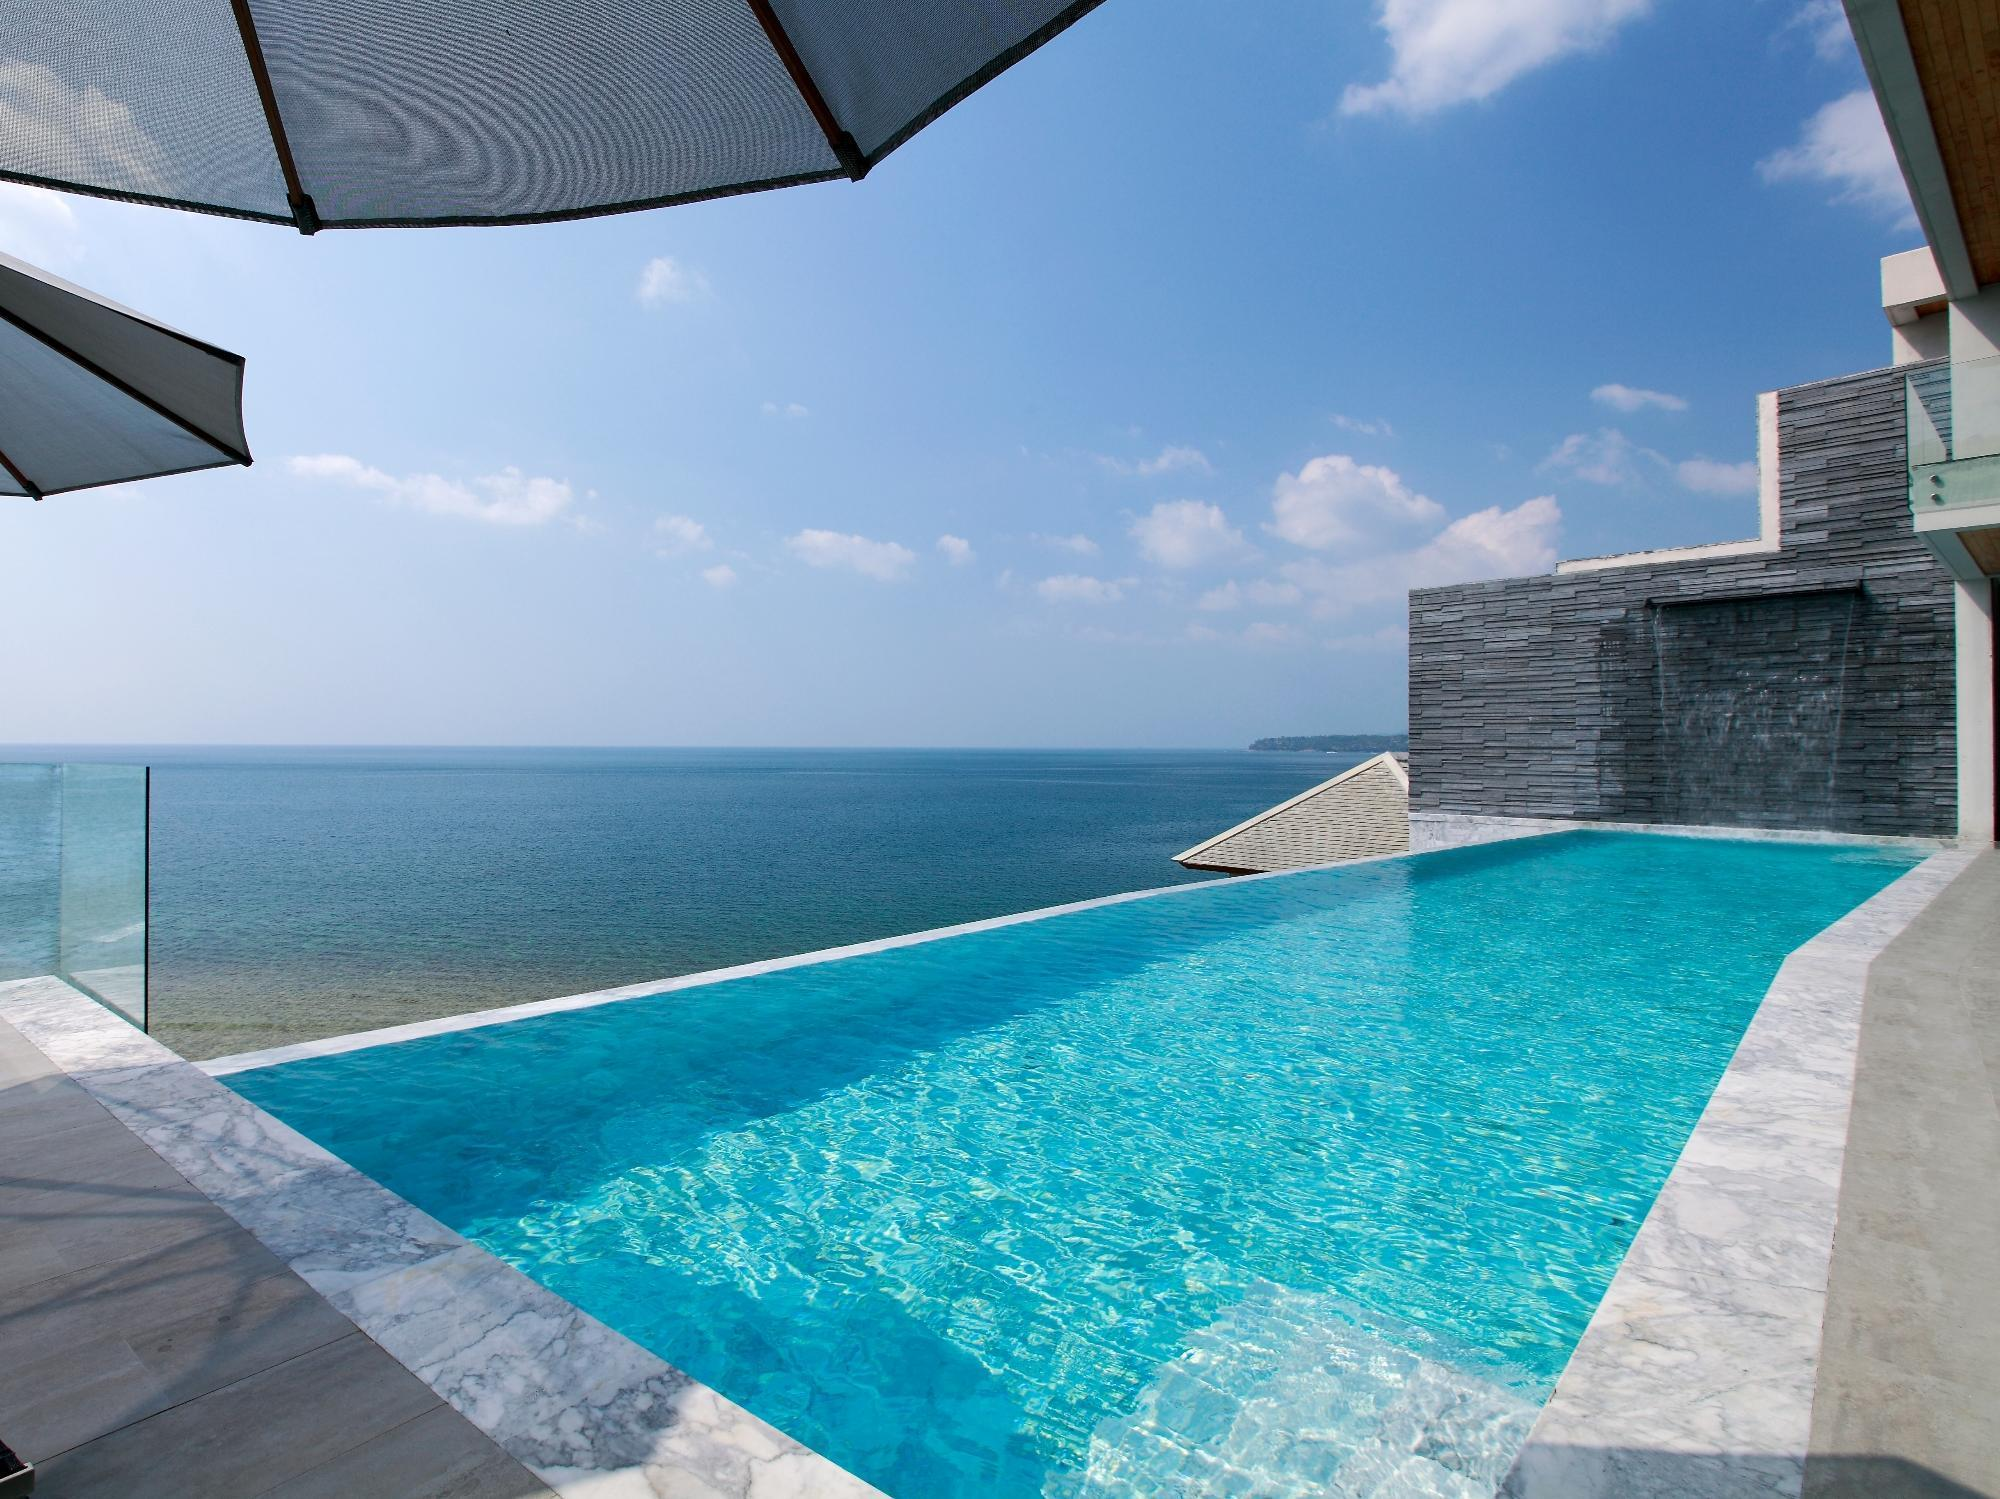 Cape Sienna Phuket Hotel and Villas15